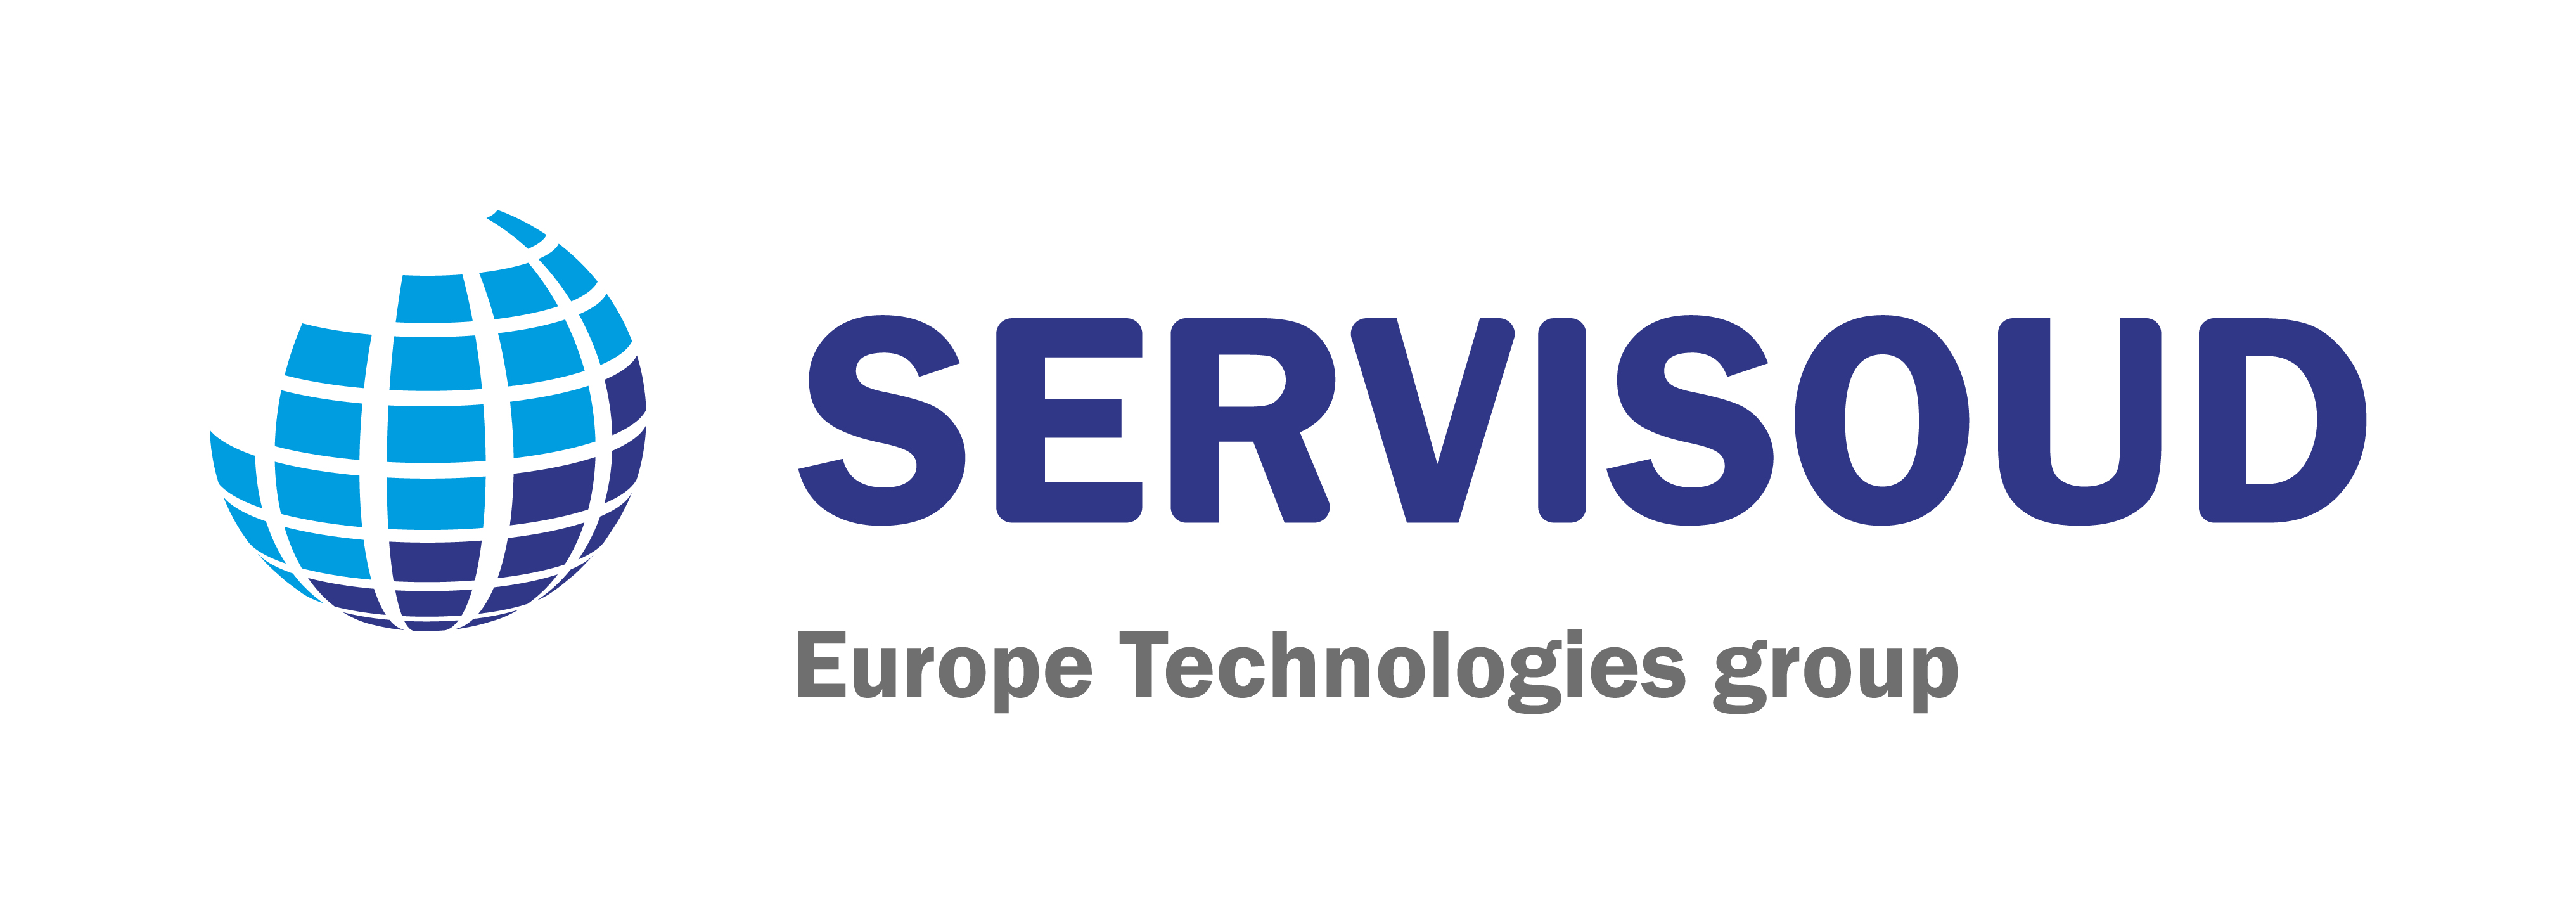 1560864789-servisoud-europe-technologies.jpg